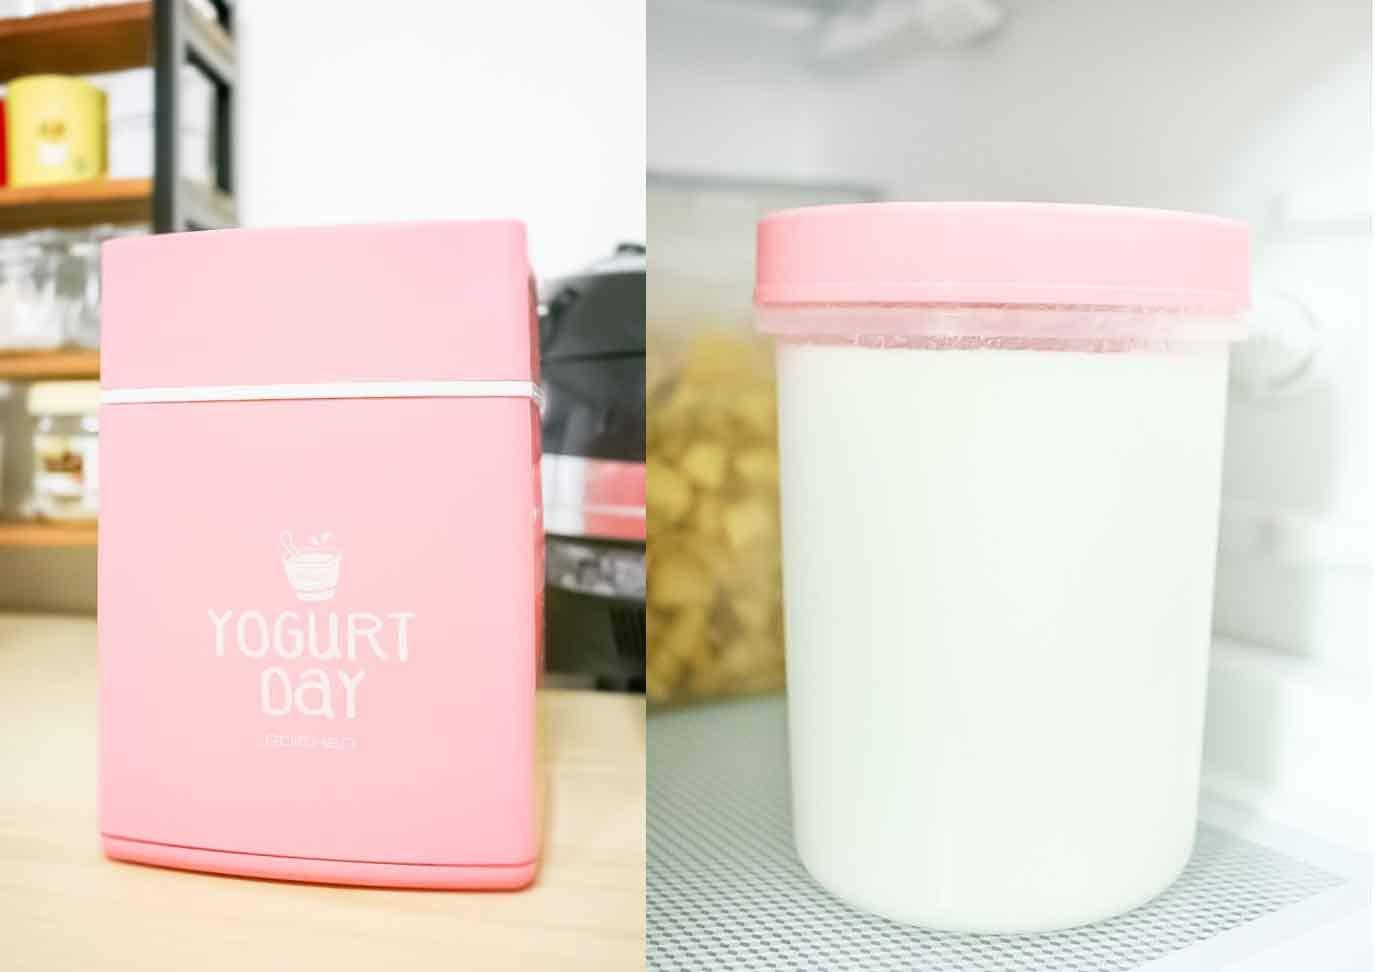 Yogurt Day Non-Electric Home Yogurt Maker, 30 Ounces, Pink by Yogurt Day (Image #6)